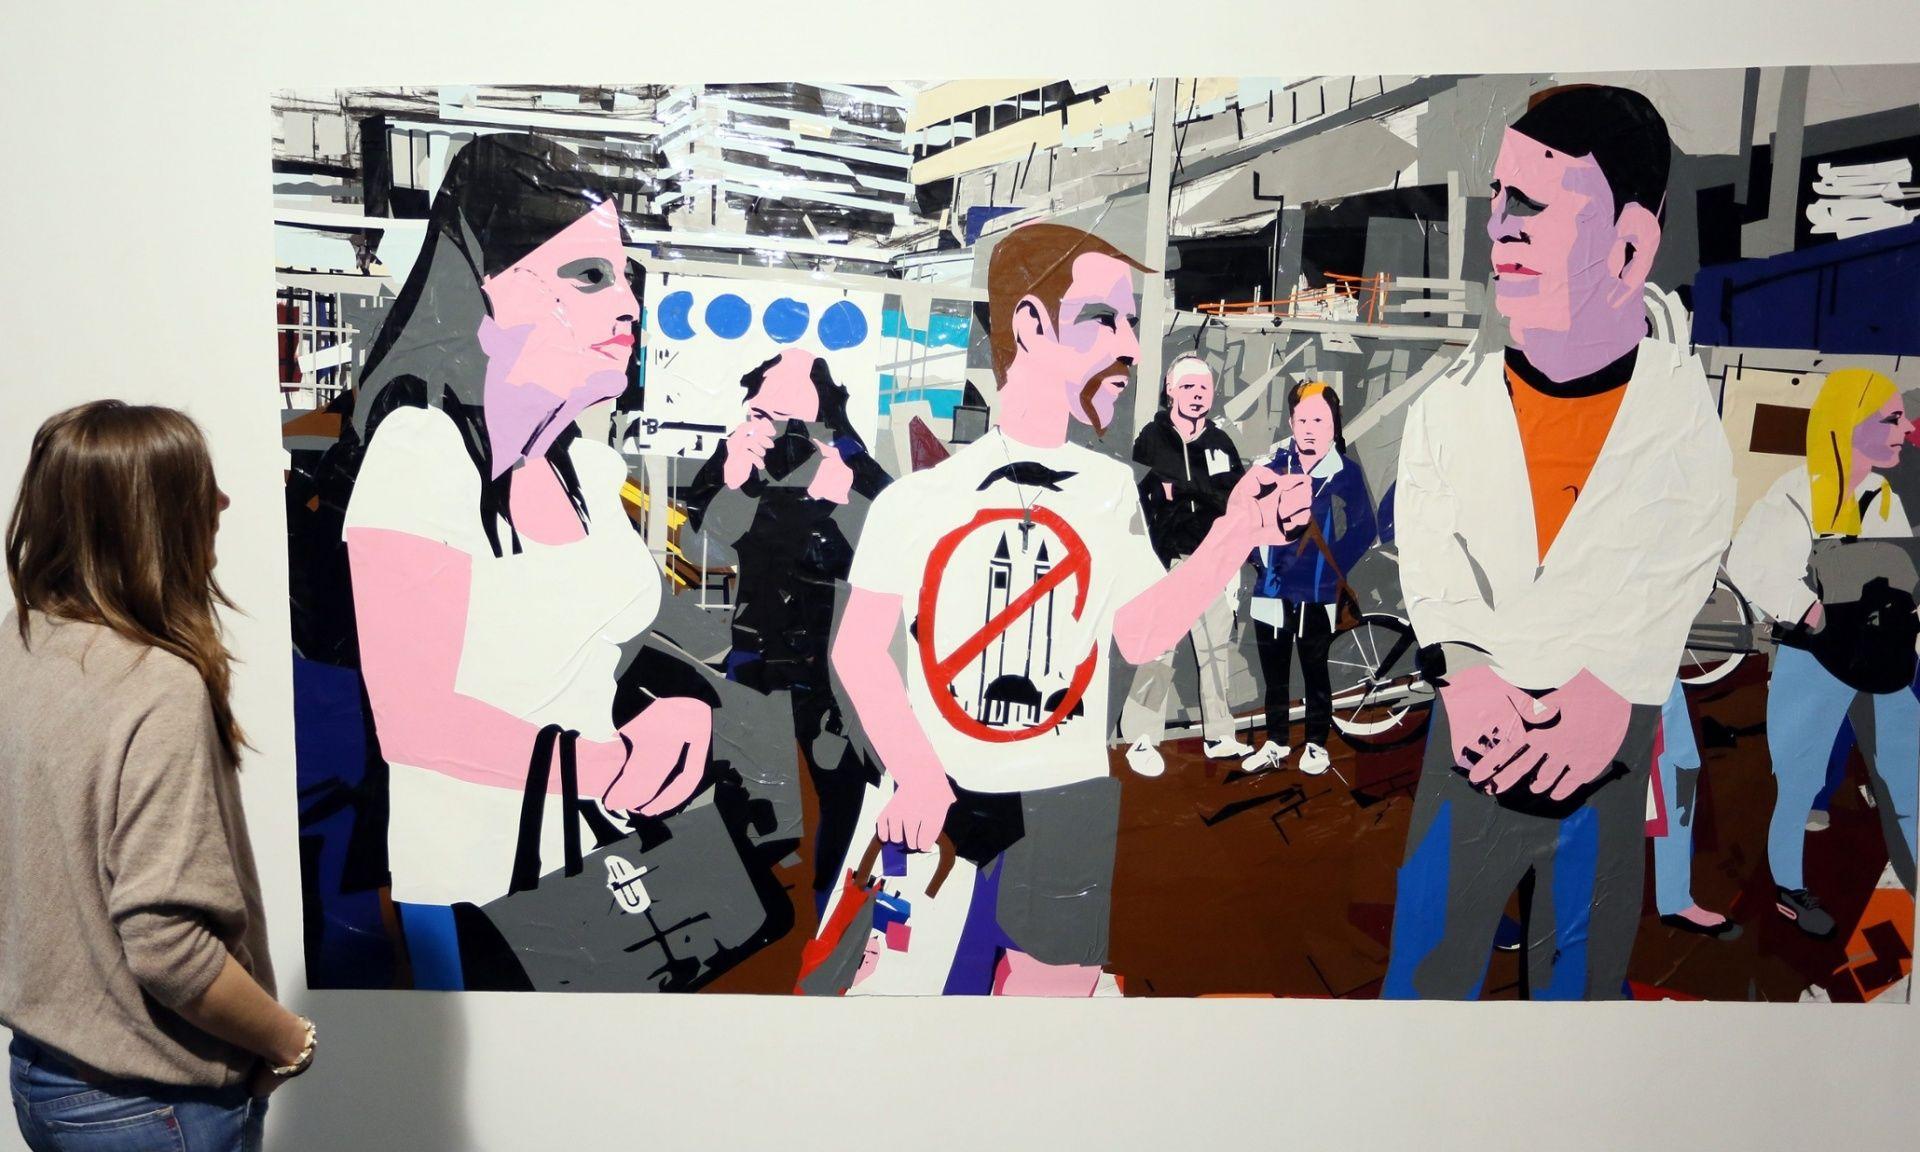 After the Riot II by Erik van Lieshout at the Guido W Baudach gallery during Berlin Gallery Weekend.